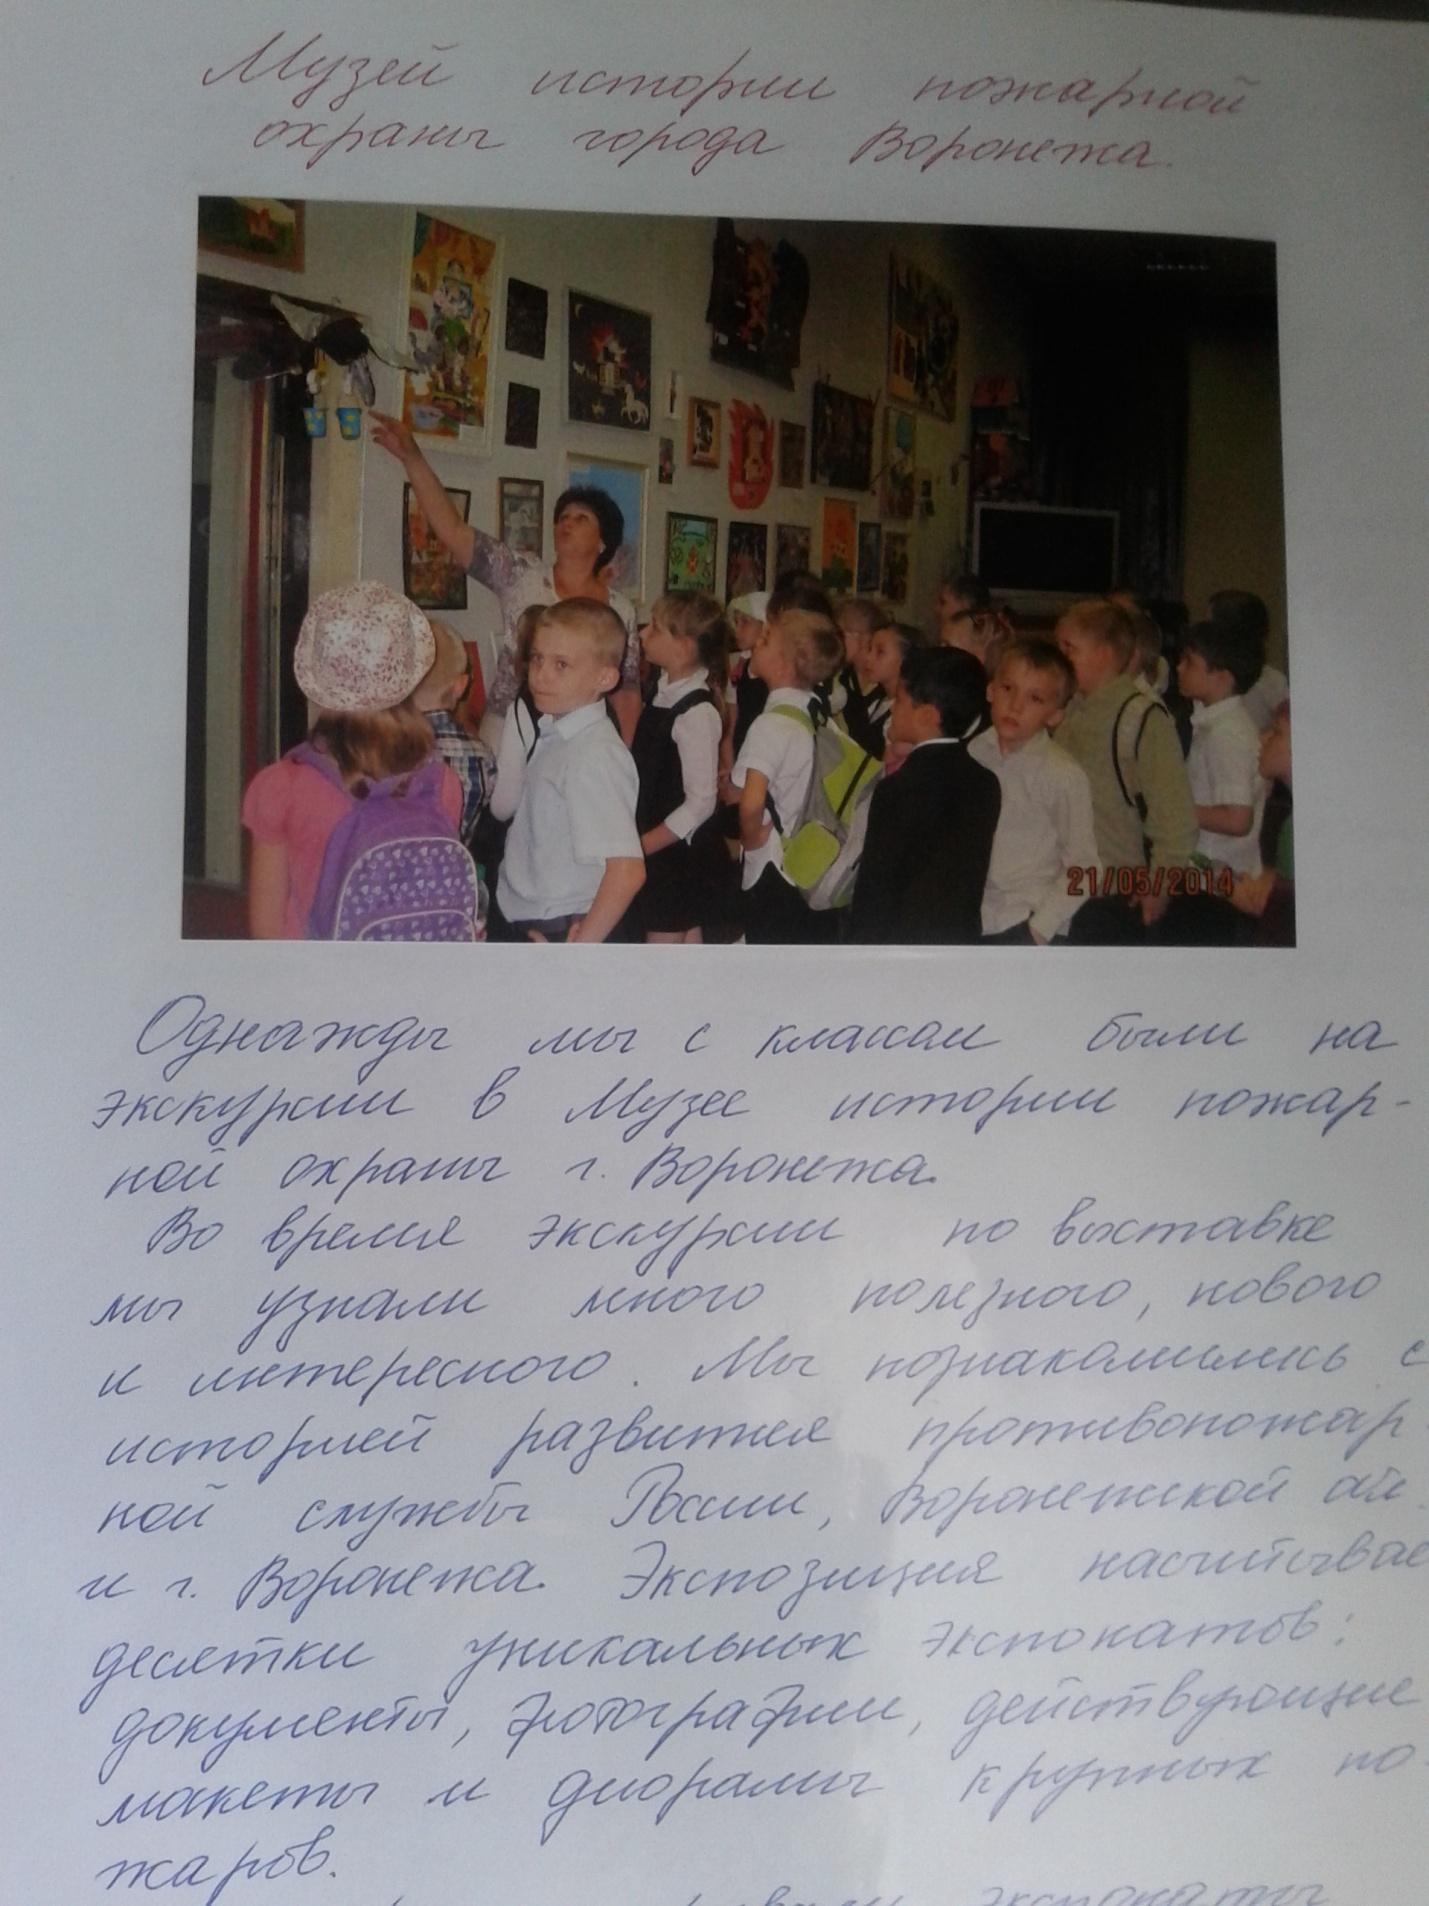 C:\Users\Vladimir\Pictures\2016-01-21 долматов портфолио\долматов портфолио 013.jpg